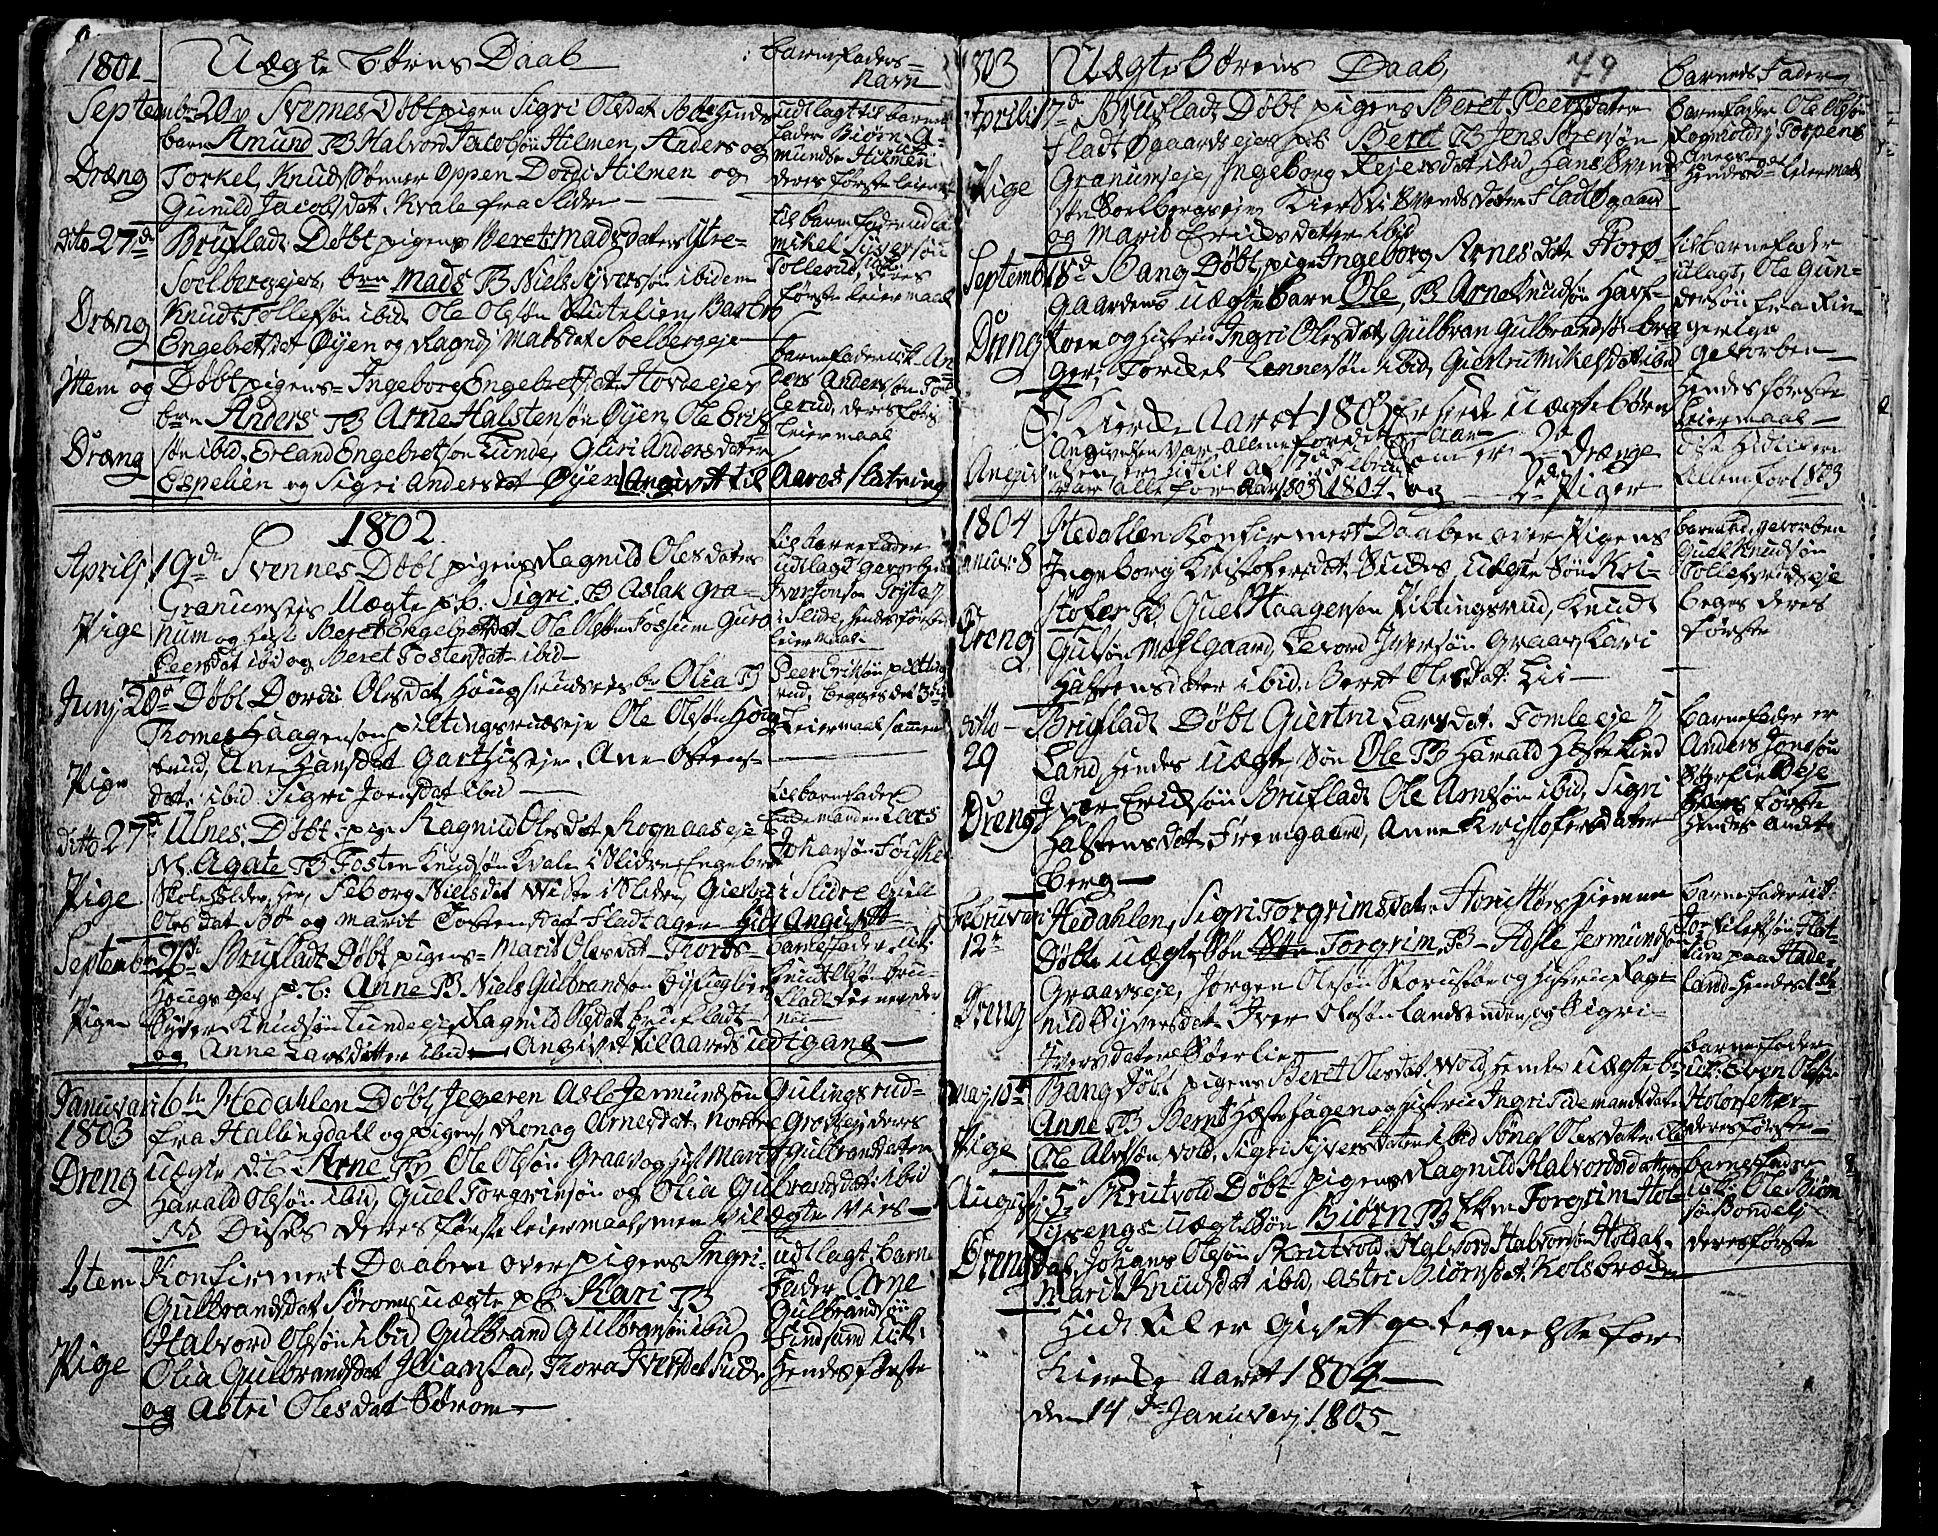 SAH, Aurdal prestekontor, Ministerialbok nr. 7, 1800-1808, s. 79